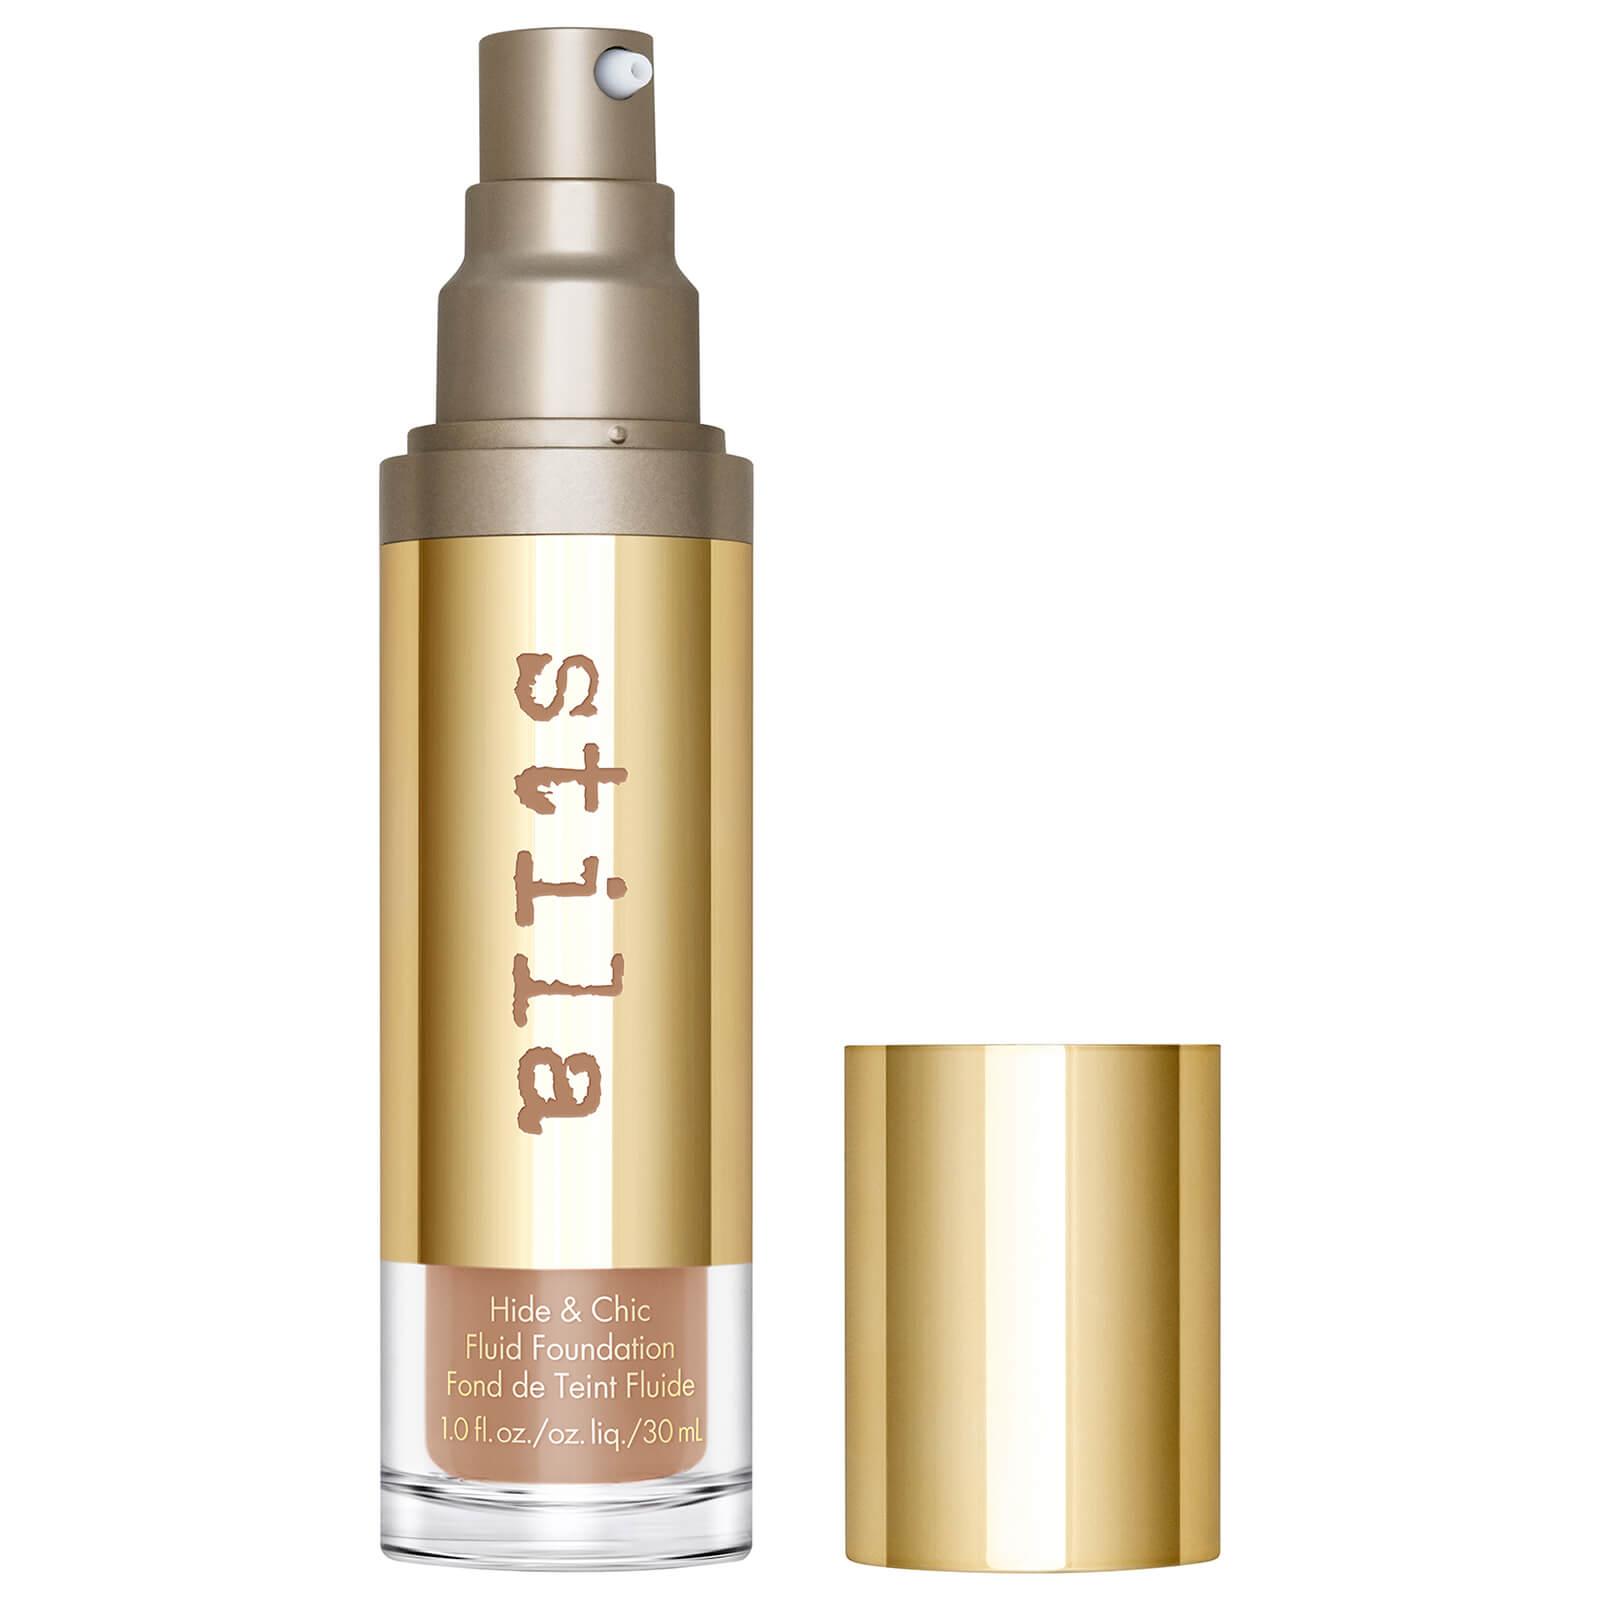 Купить Stila Hide and Chic Fluid Foundation 30ml (Various Shades) - Tan 2